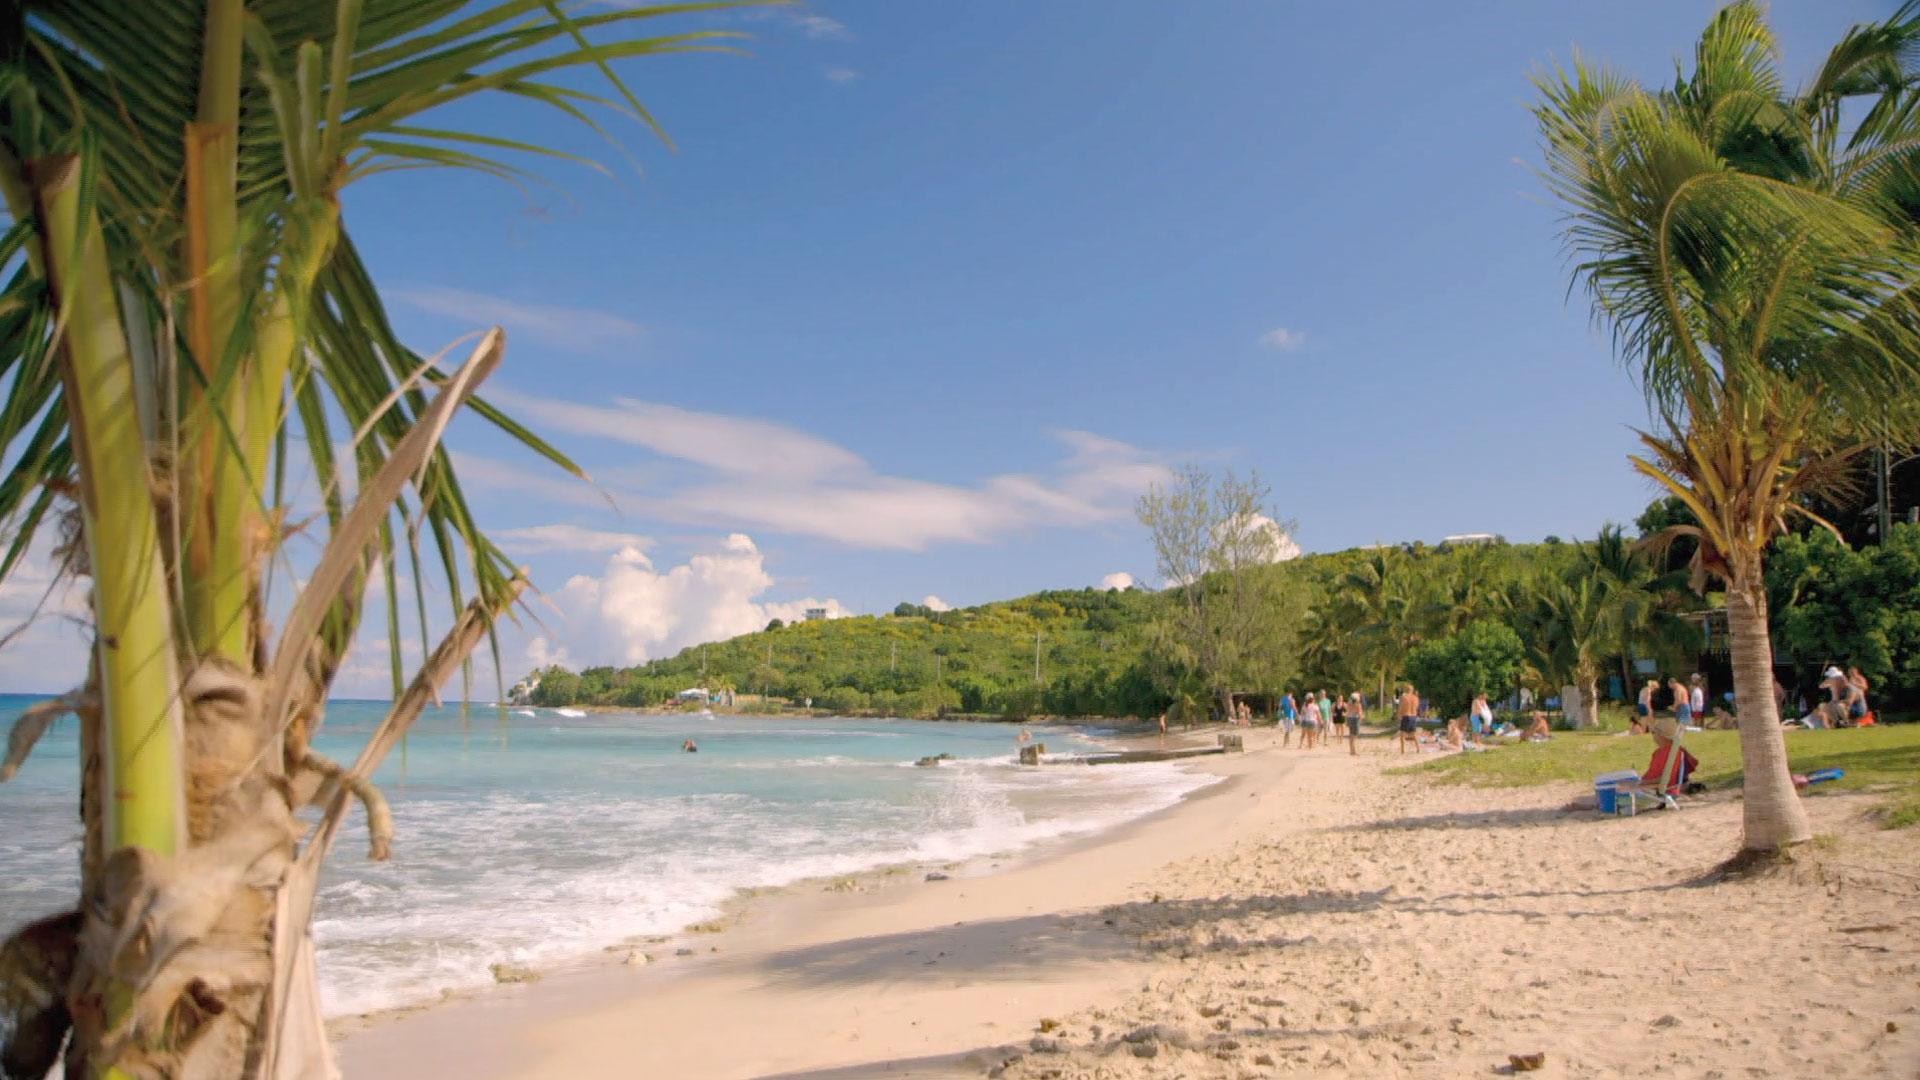 Castaway in Cane Bay